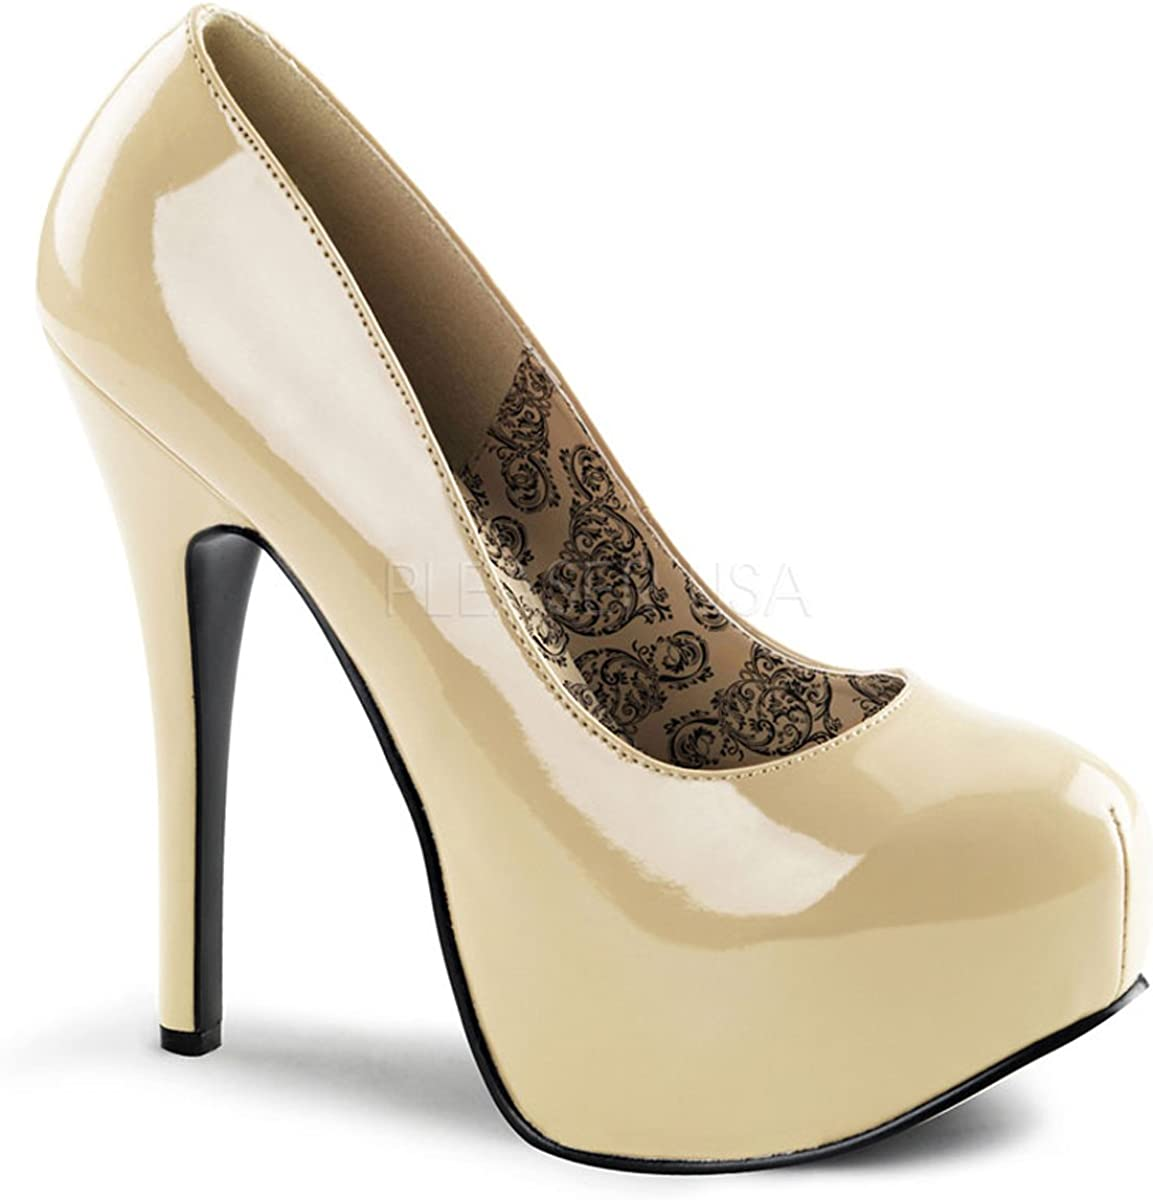 Bordello Womens Casual Dress Shoes Cream Pumps Patent Platform Round Toe 5 34 Inch Heel Size: 7 Beige